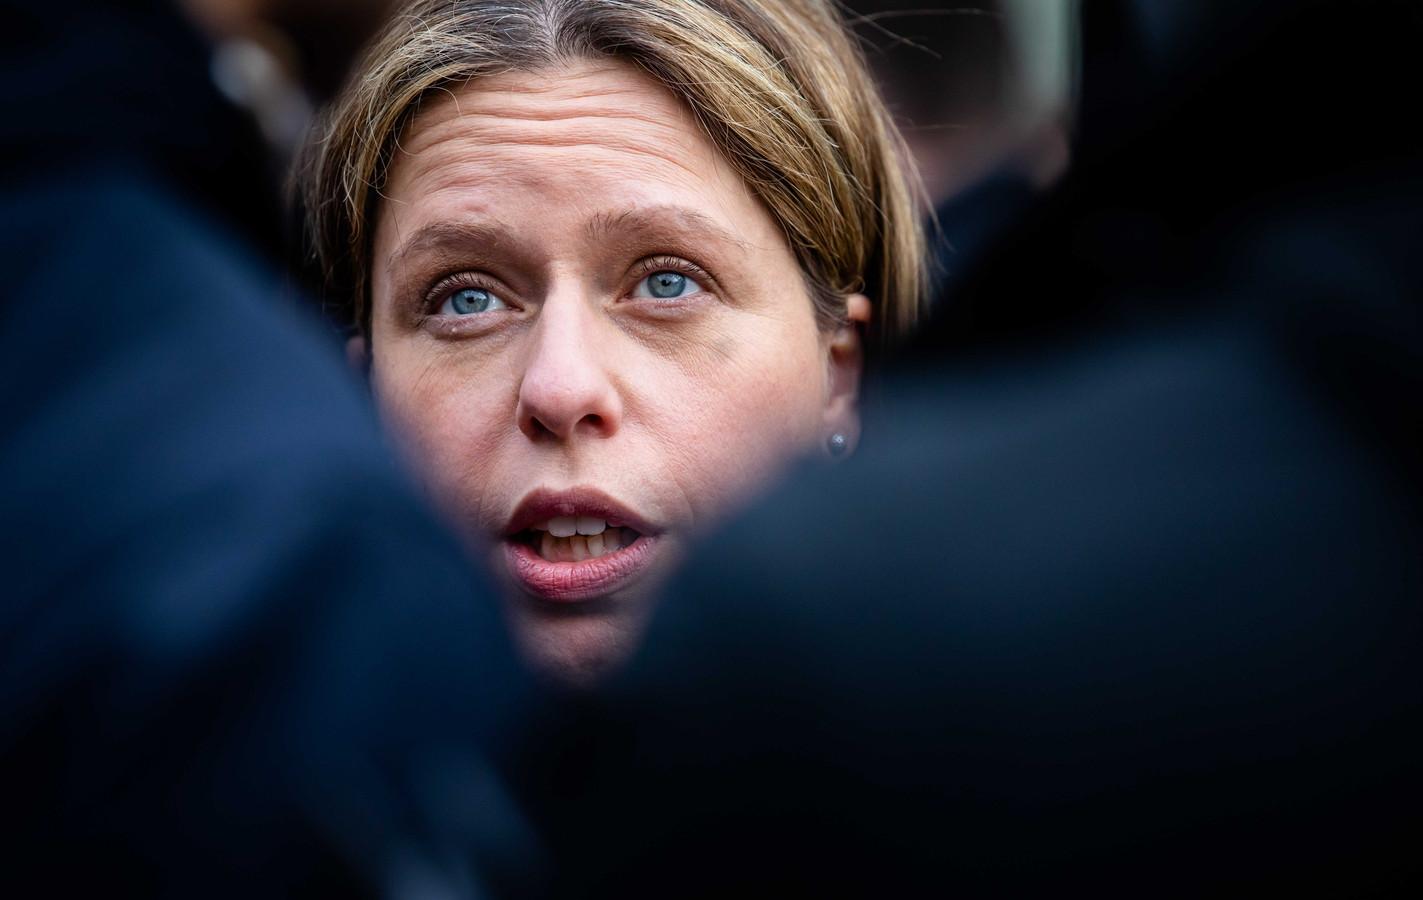 Minister Carola Schouten